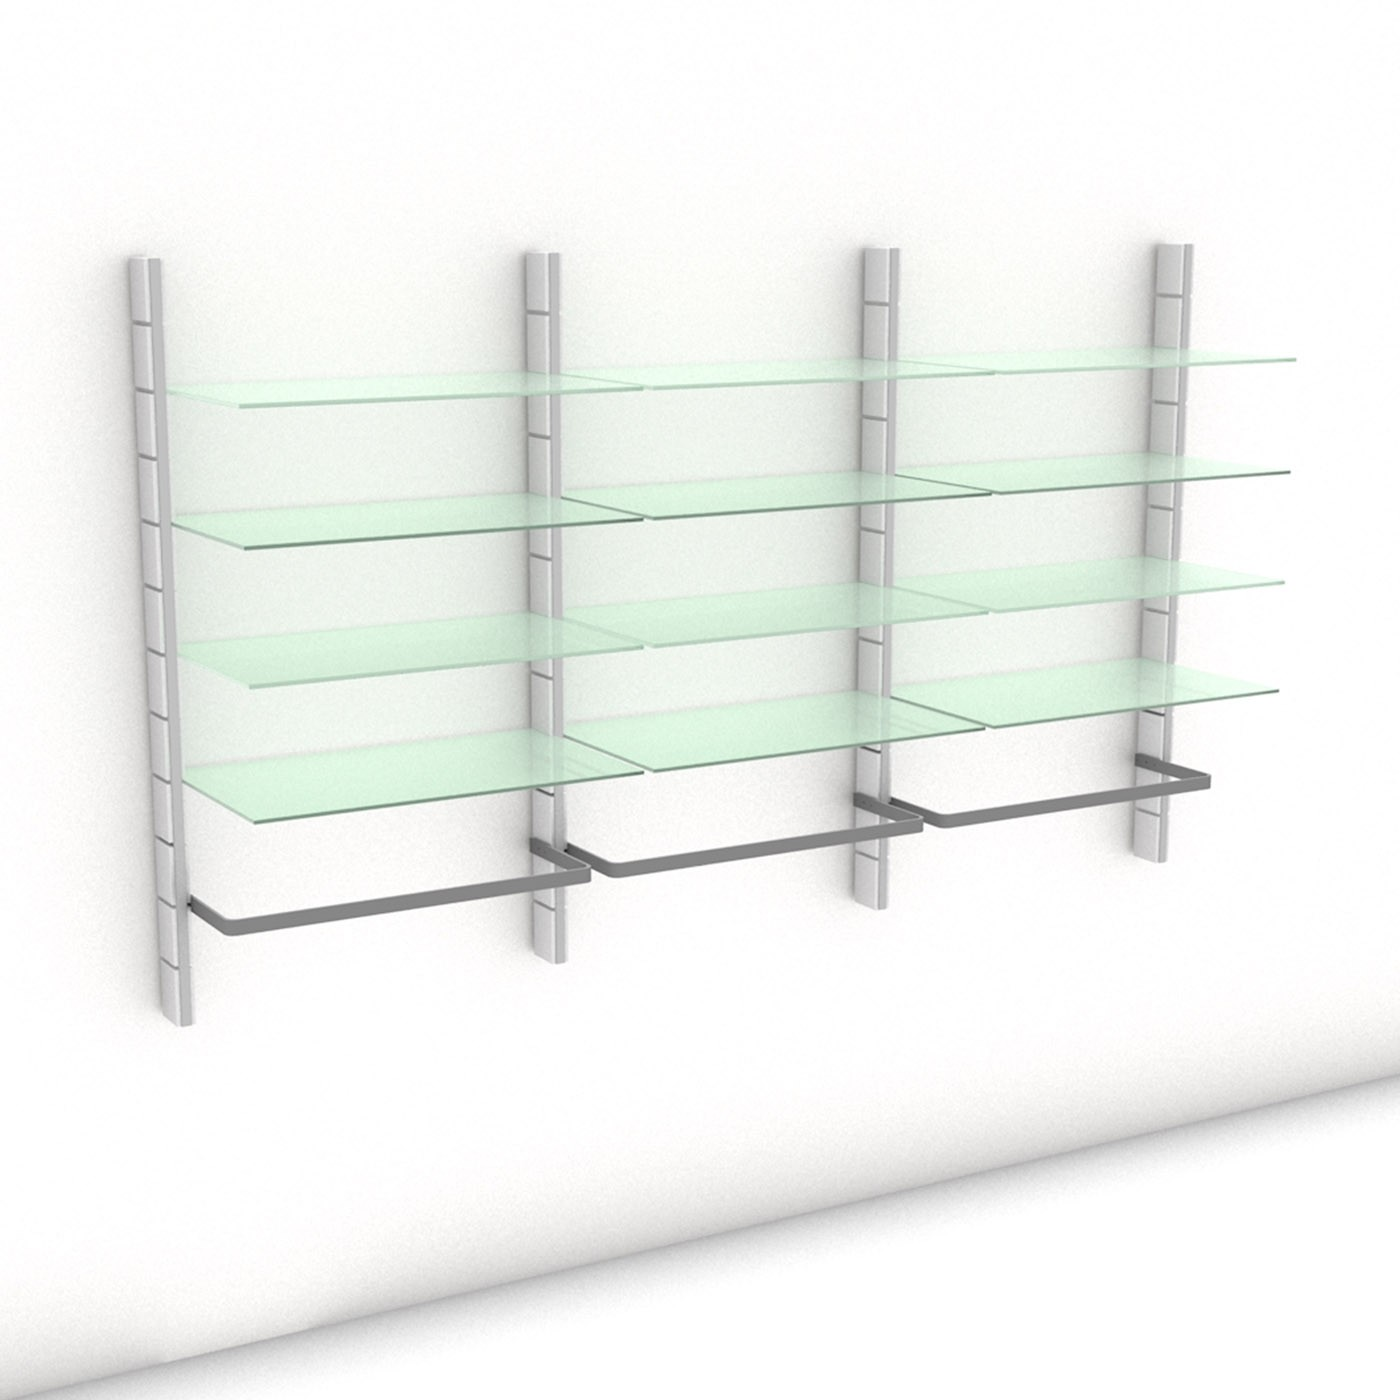 Begehbarer Kleiderschrank - Prime (L) 244 - Maß: 244 x 143,2 x 45 cm (B x H x T)